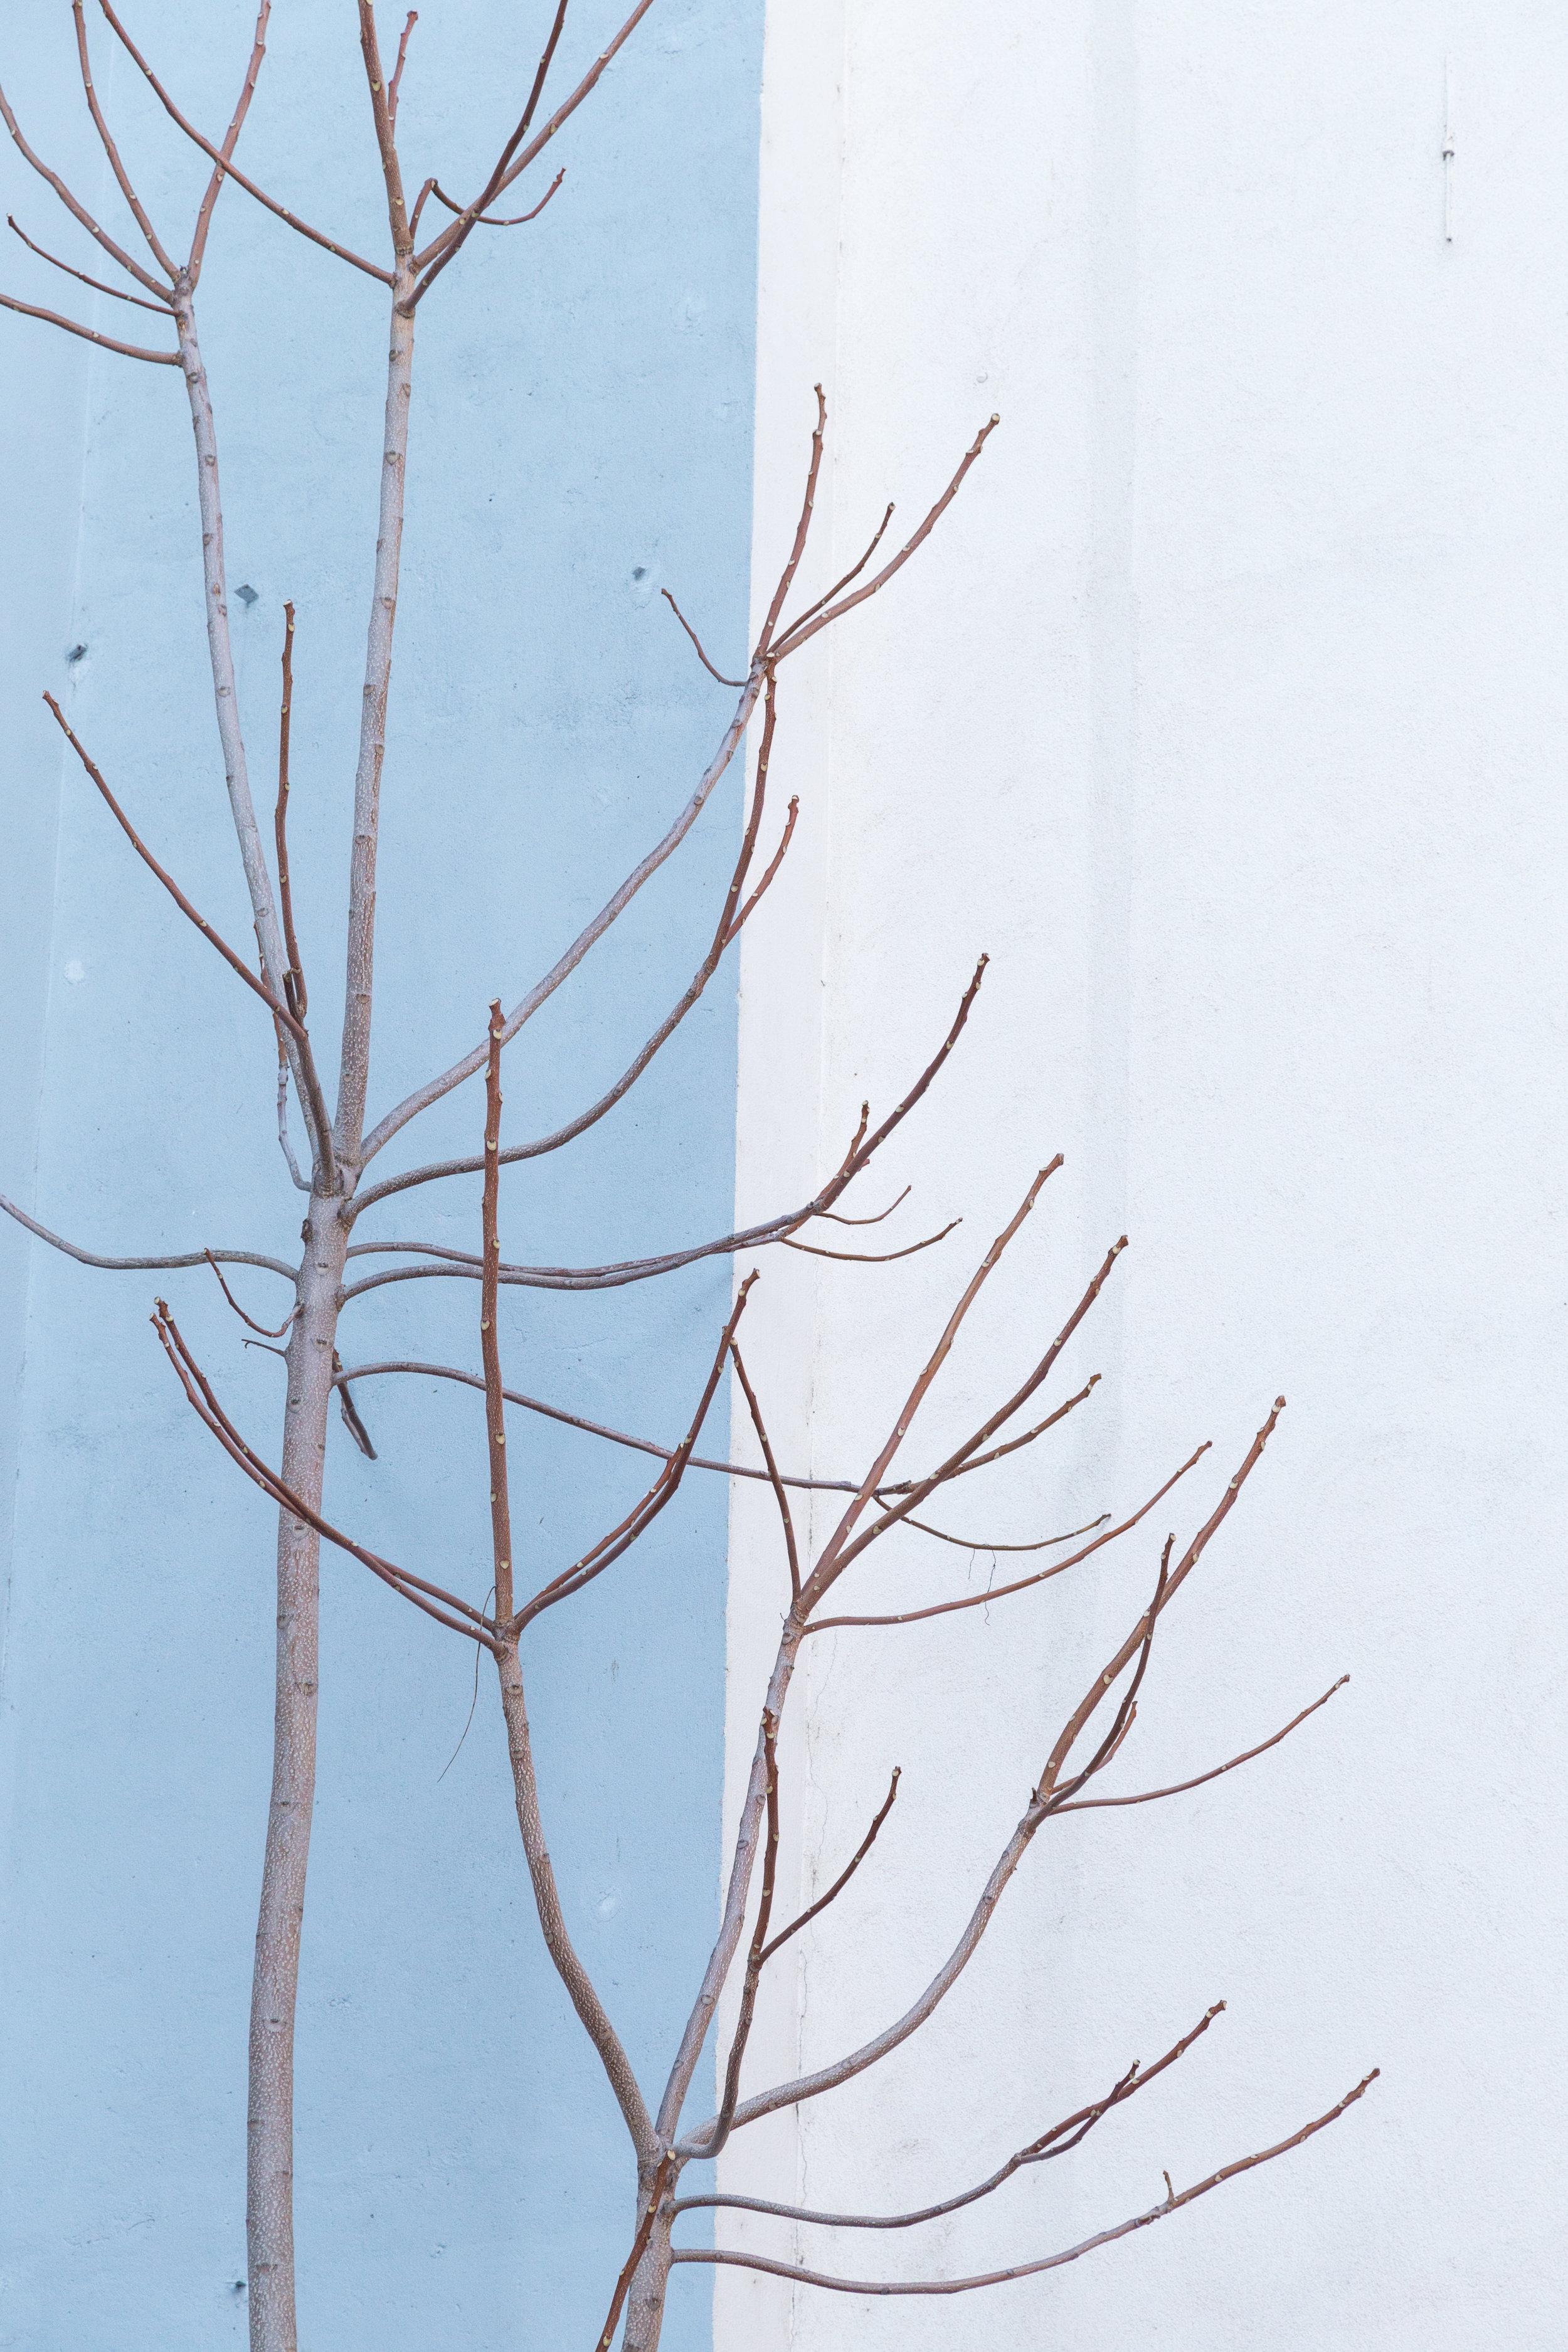 gregor-nobis-flaecheninhalt-1